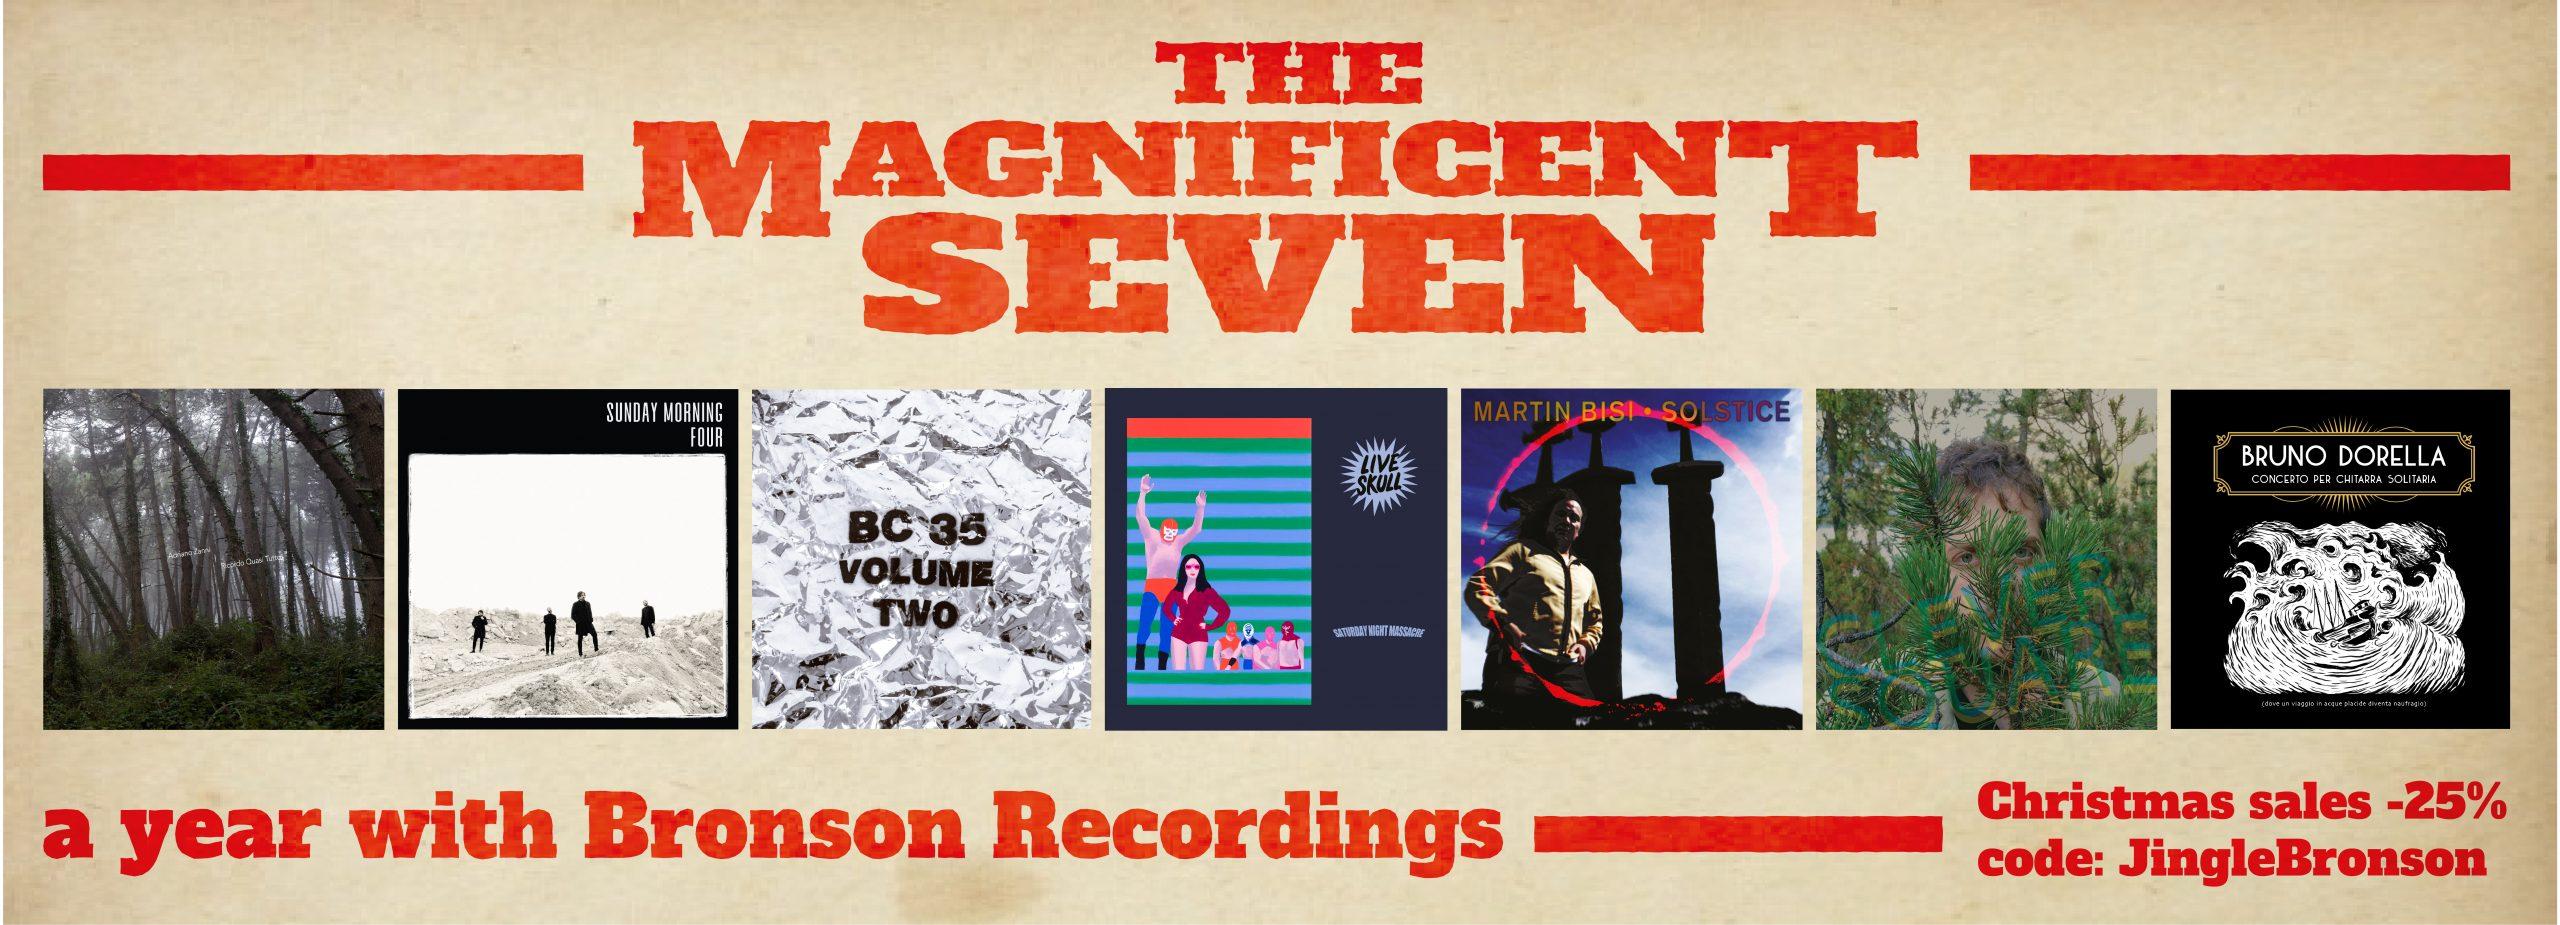 I Migliori Album del 2019 secondo Chris Angiolini